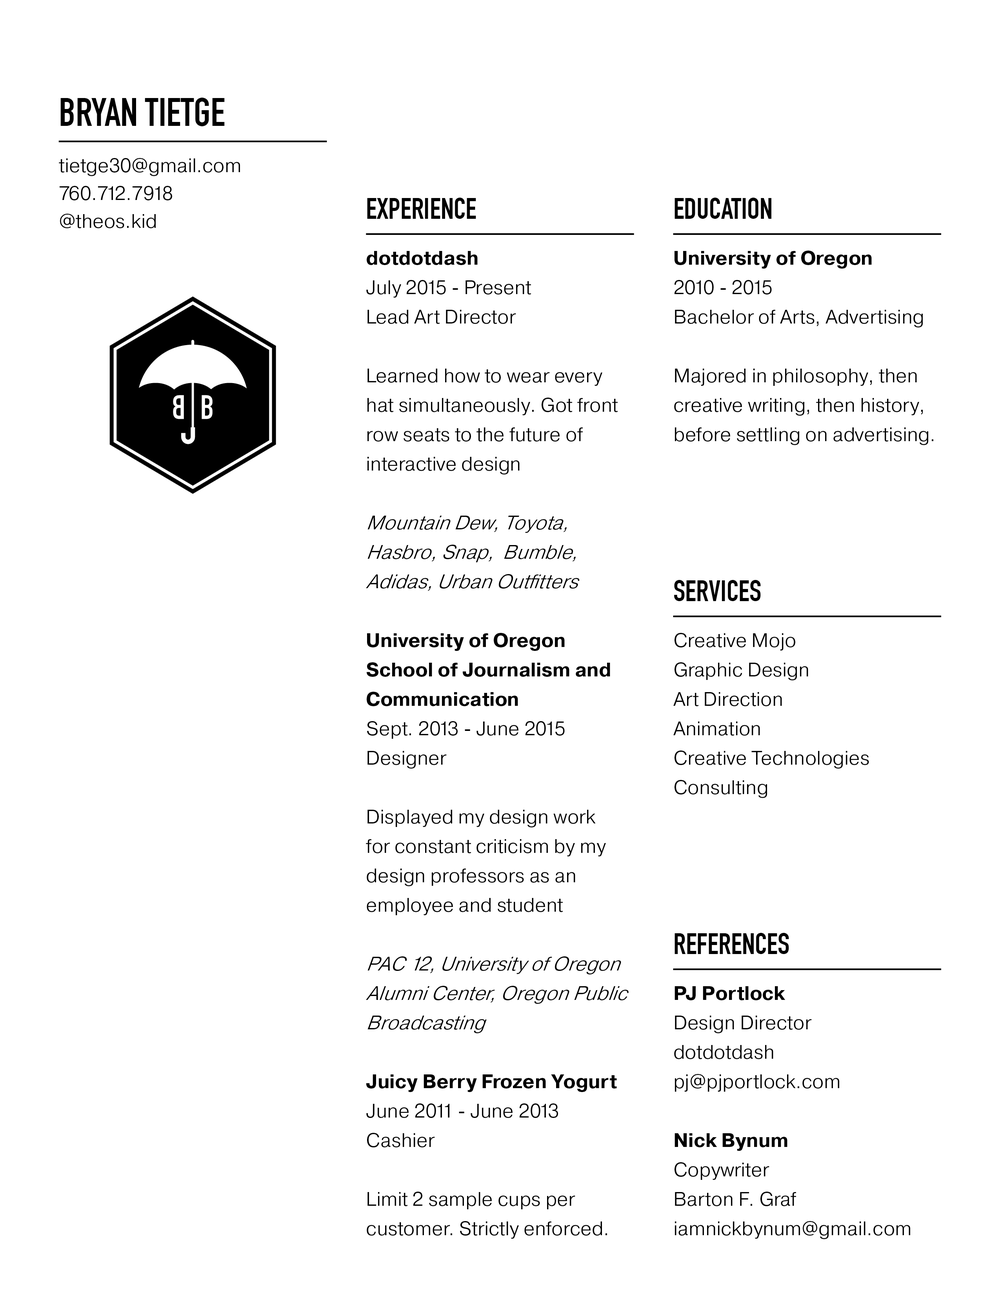 btietge_resume.png